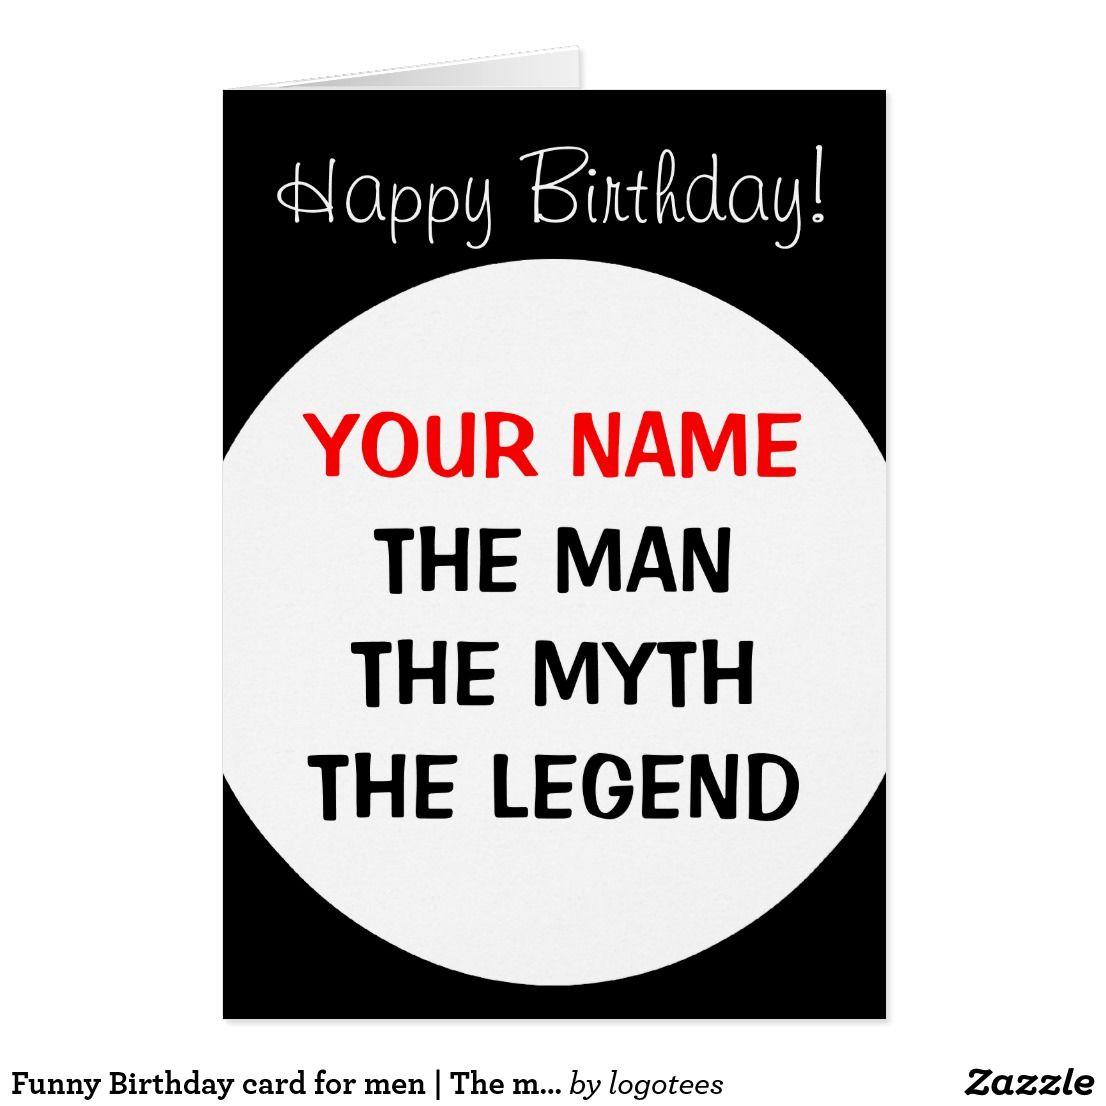 Funny birthday card for men the man myth legend funny greeting funny birthday card for men the man myth legend kristyandbryce Choice Image